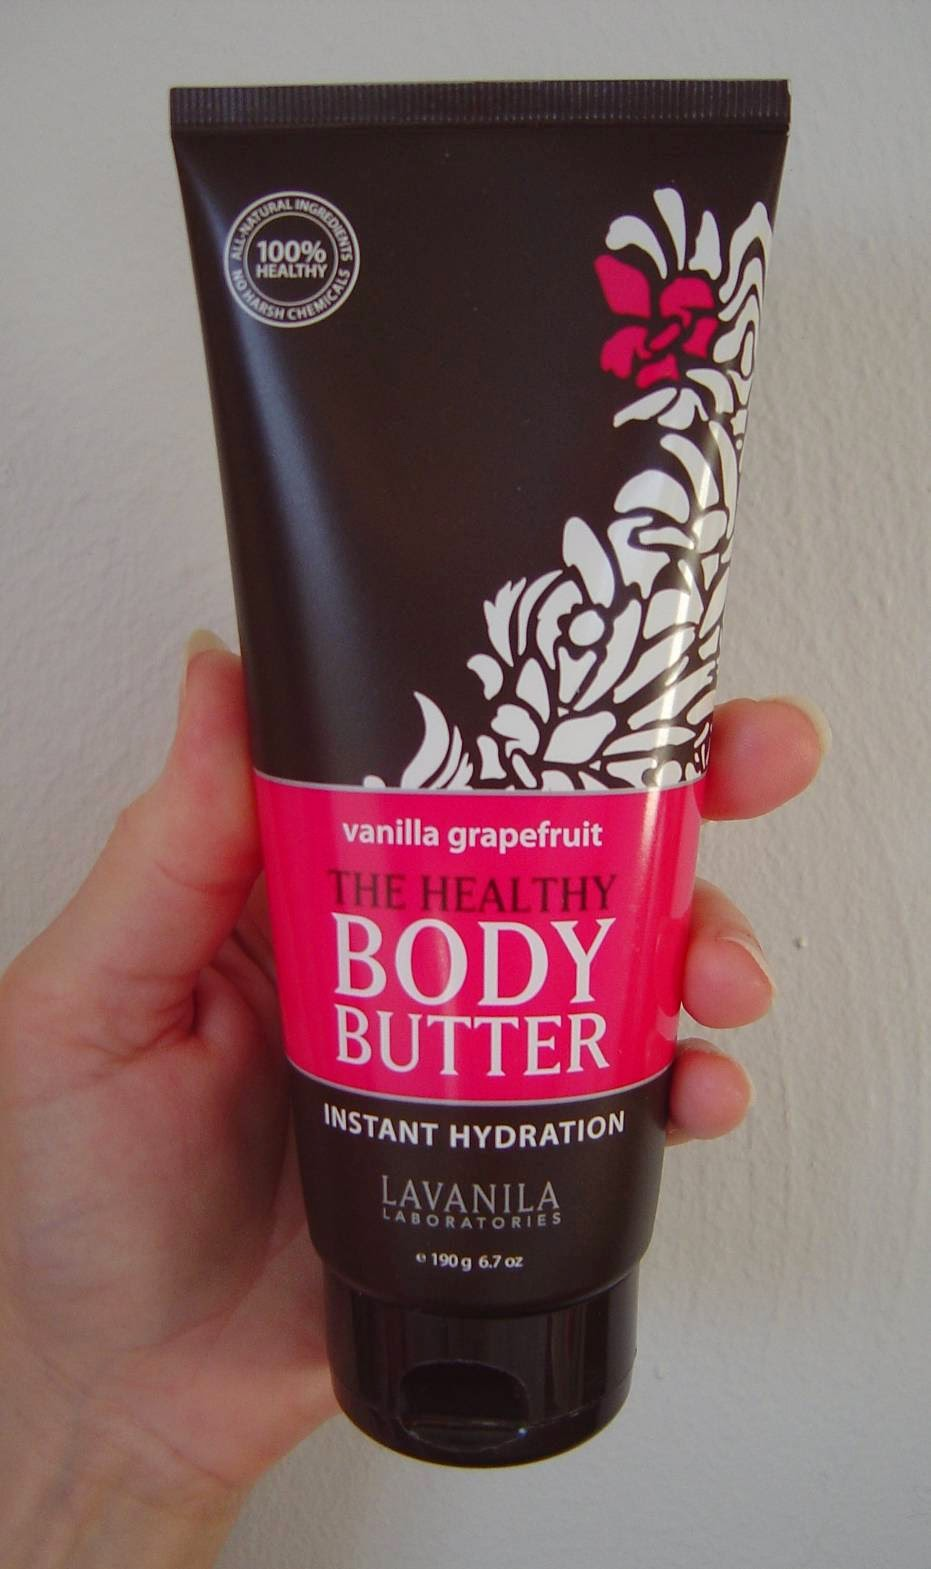 Lavanila's Vanilla Grapefruit Body Butter.jpeg